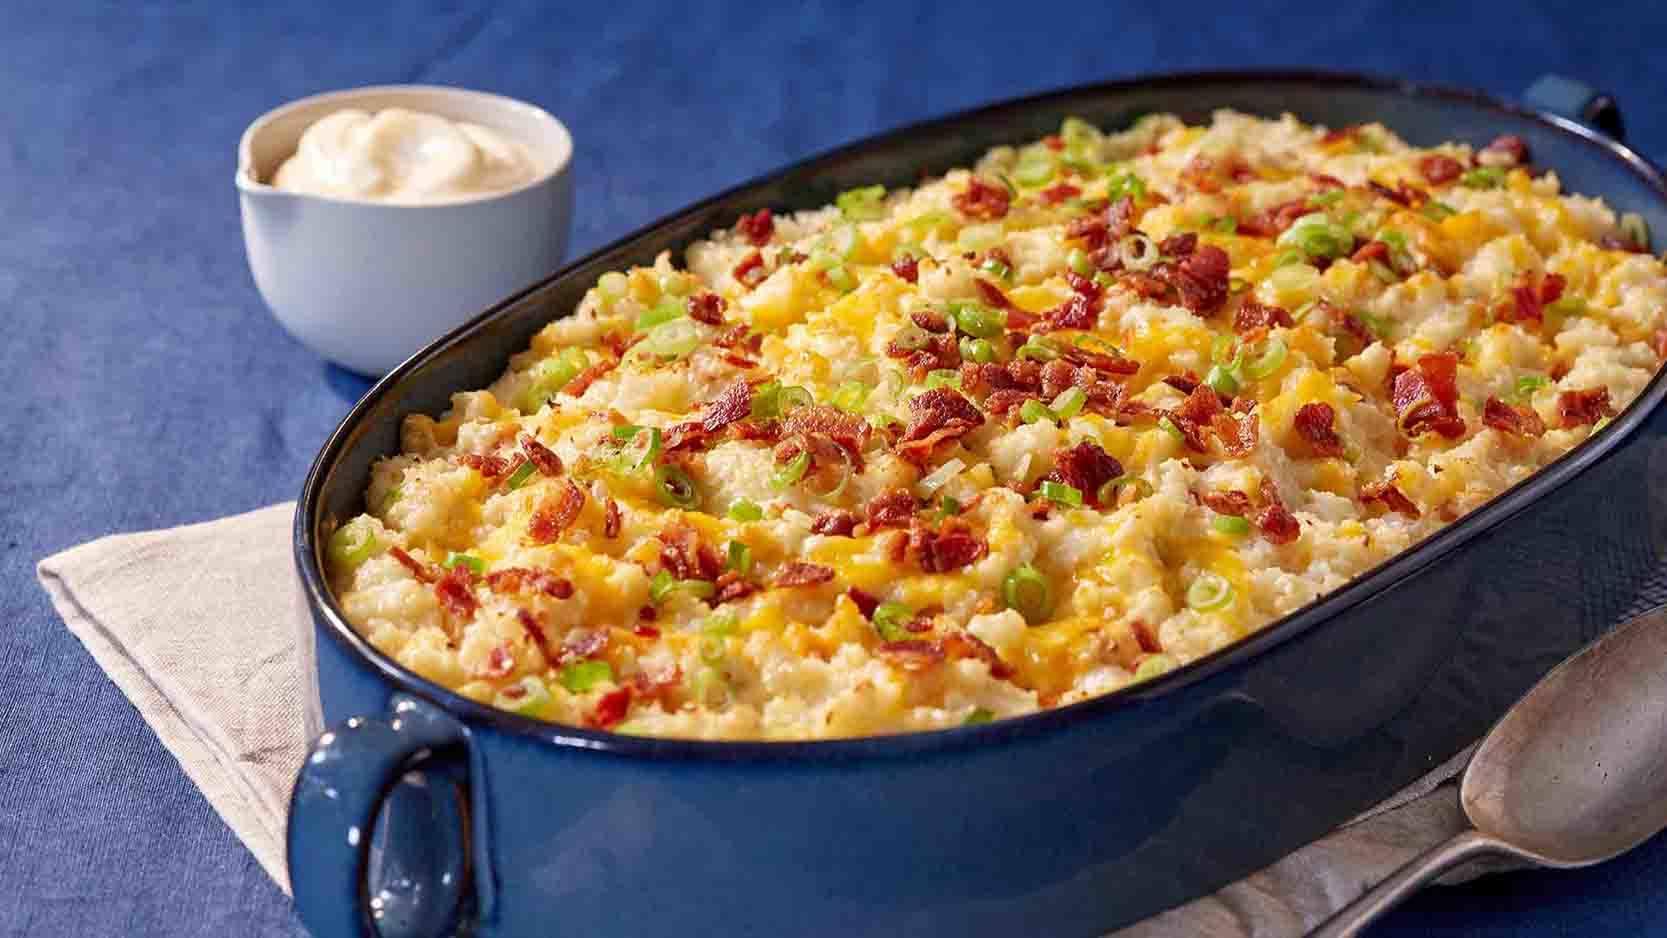 Rich & Creamy Loaded Mashed Cauliflower Recipe